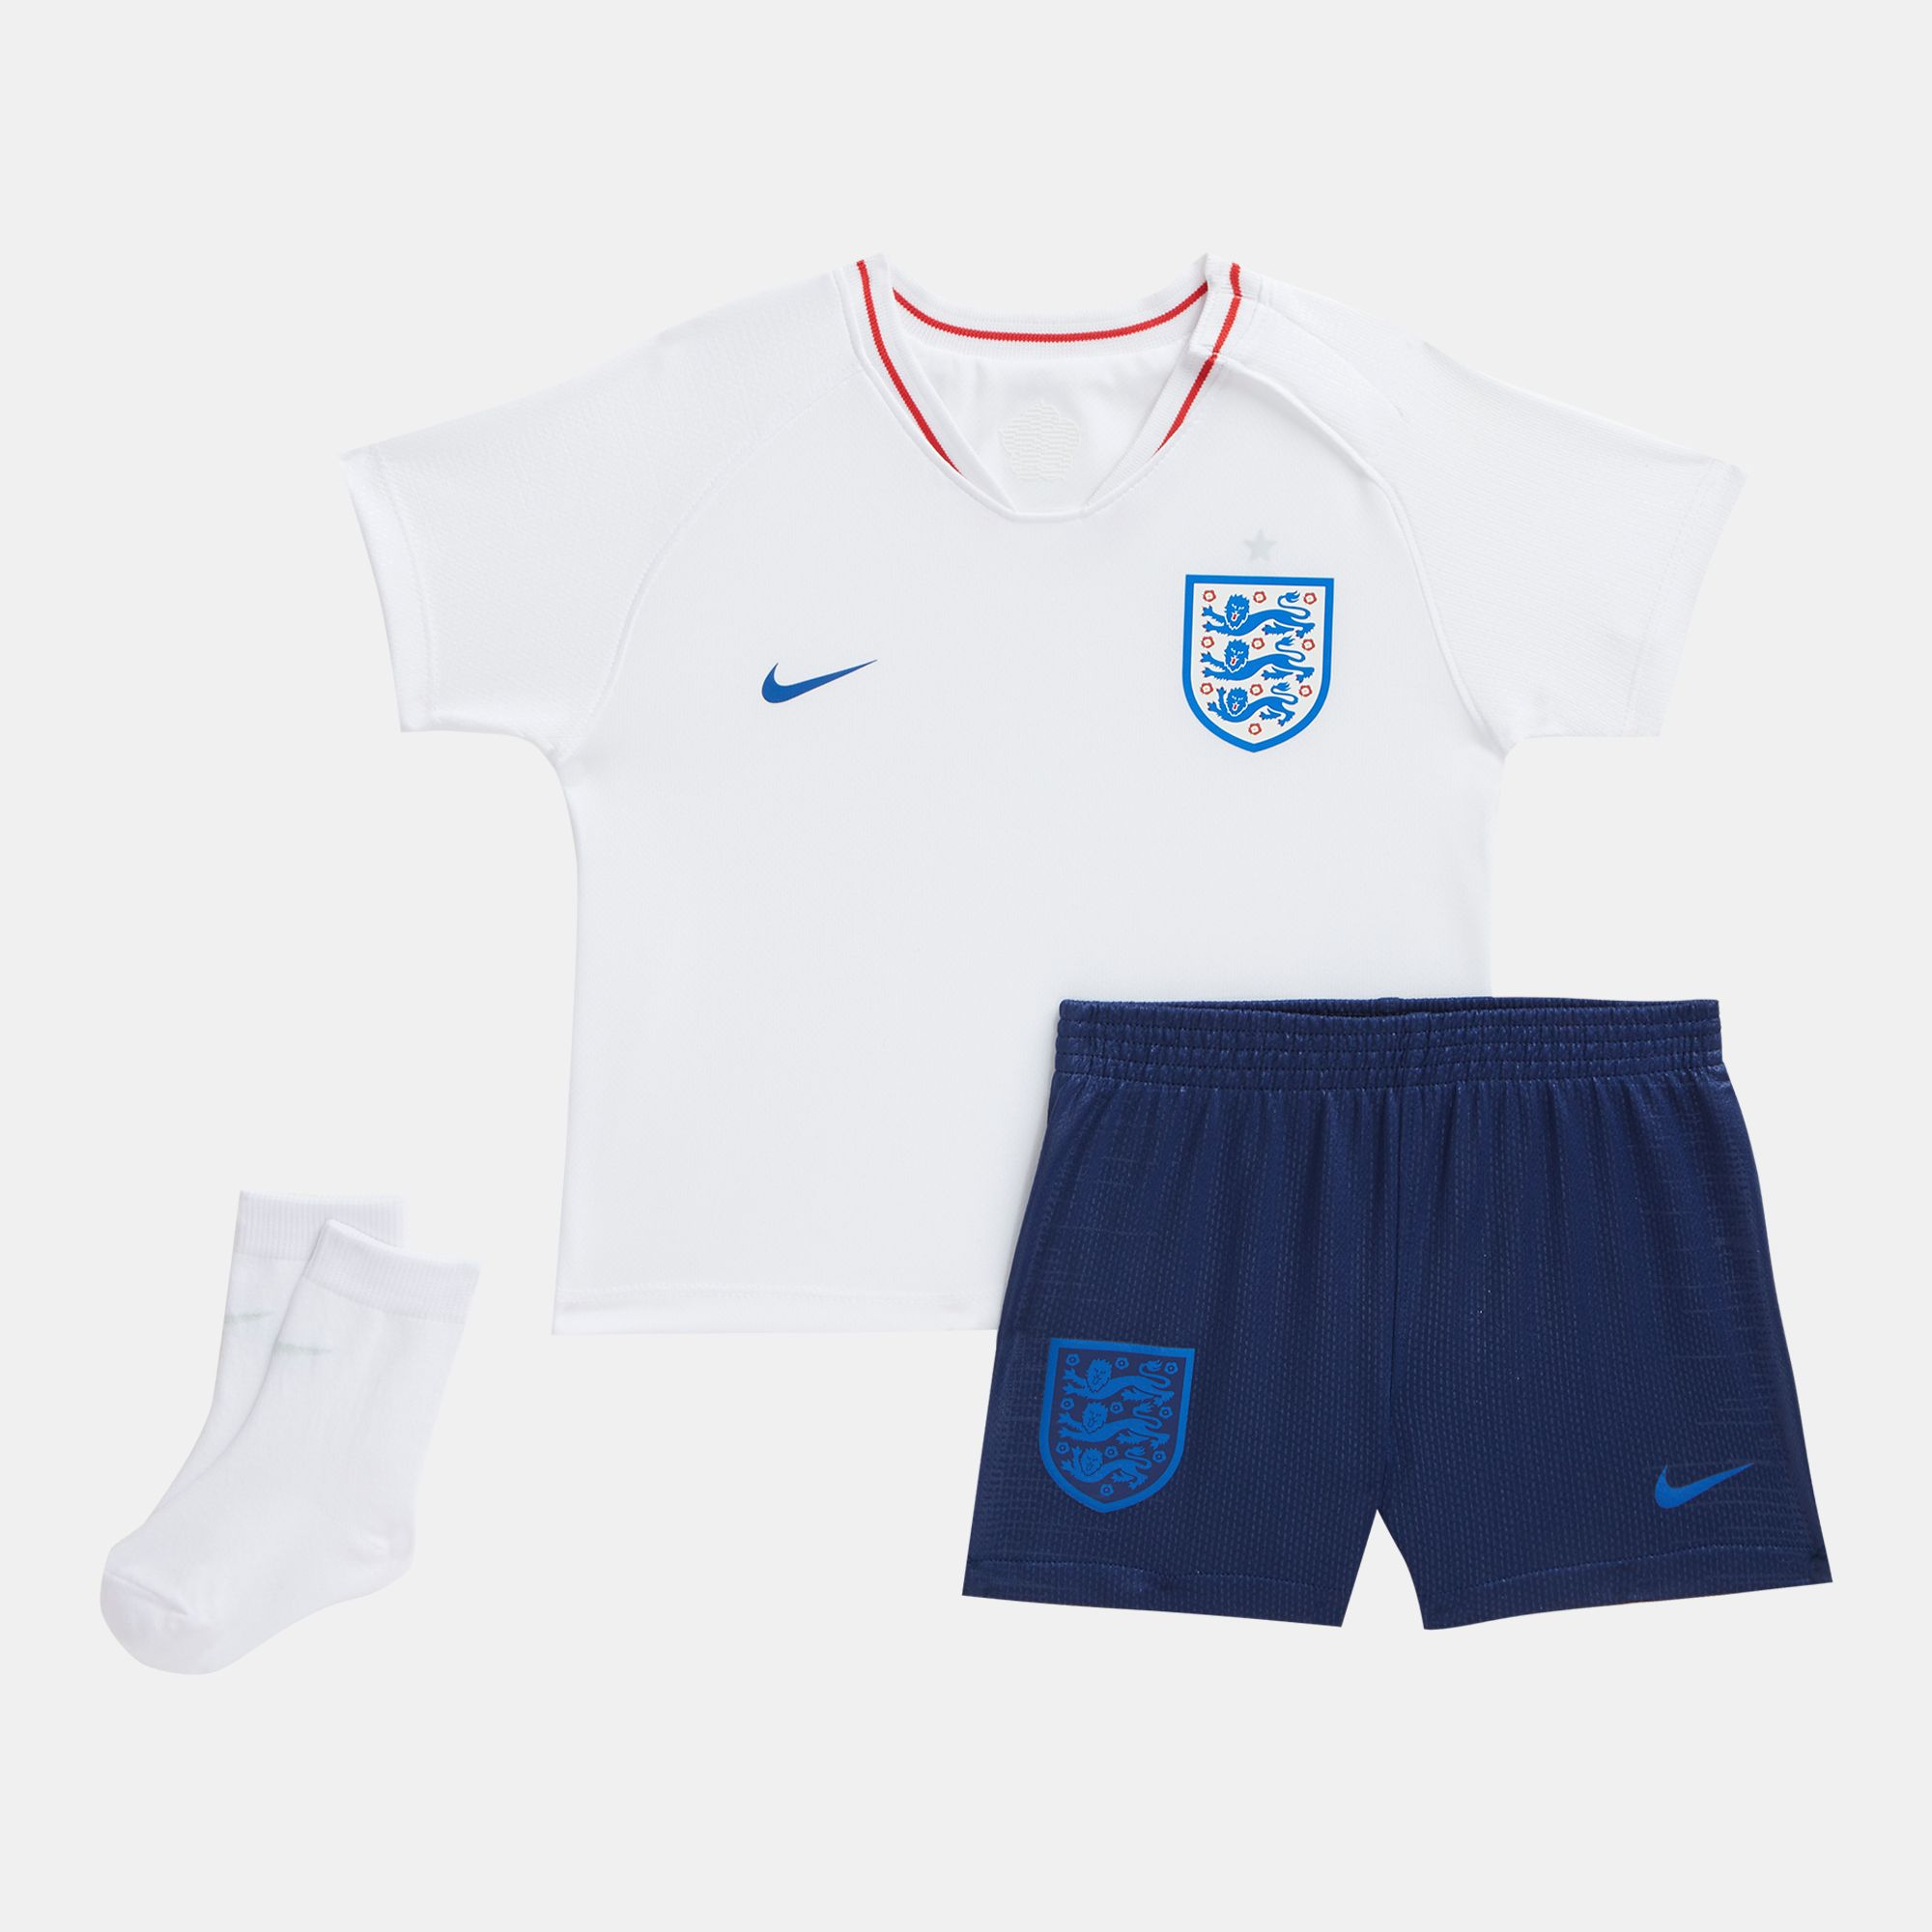 f0d0c19d4f65 Shop White Nike Kids  England Stadium Home Football Kit (Infant ...